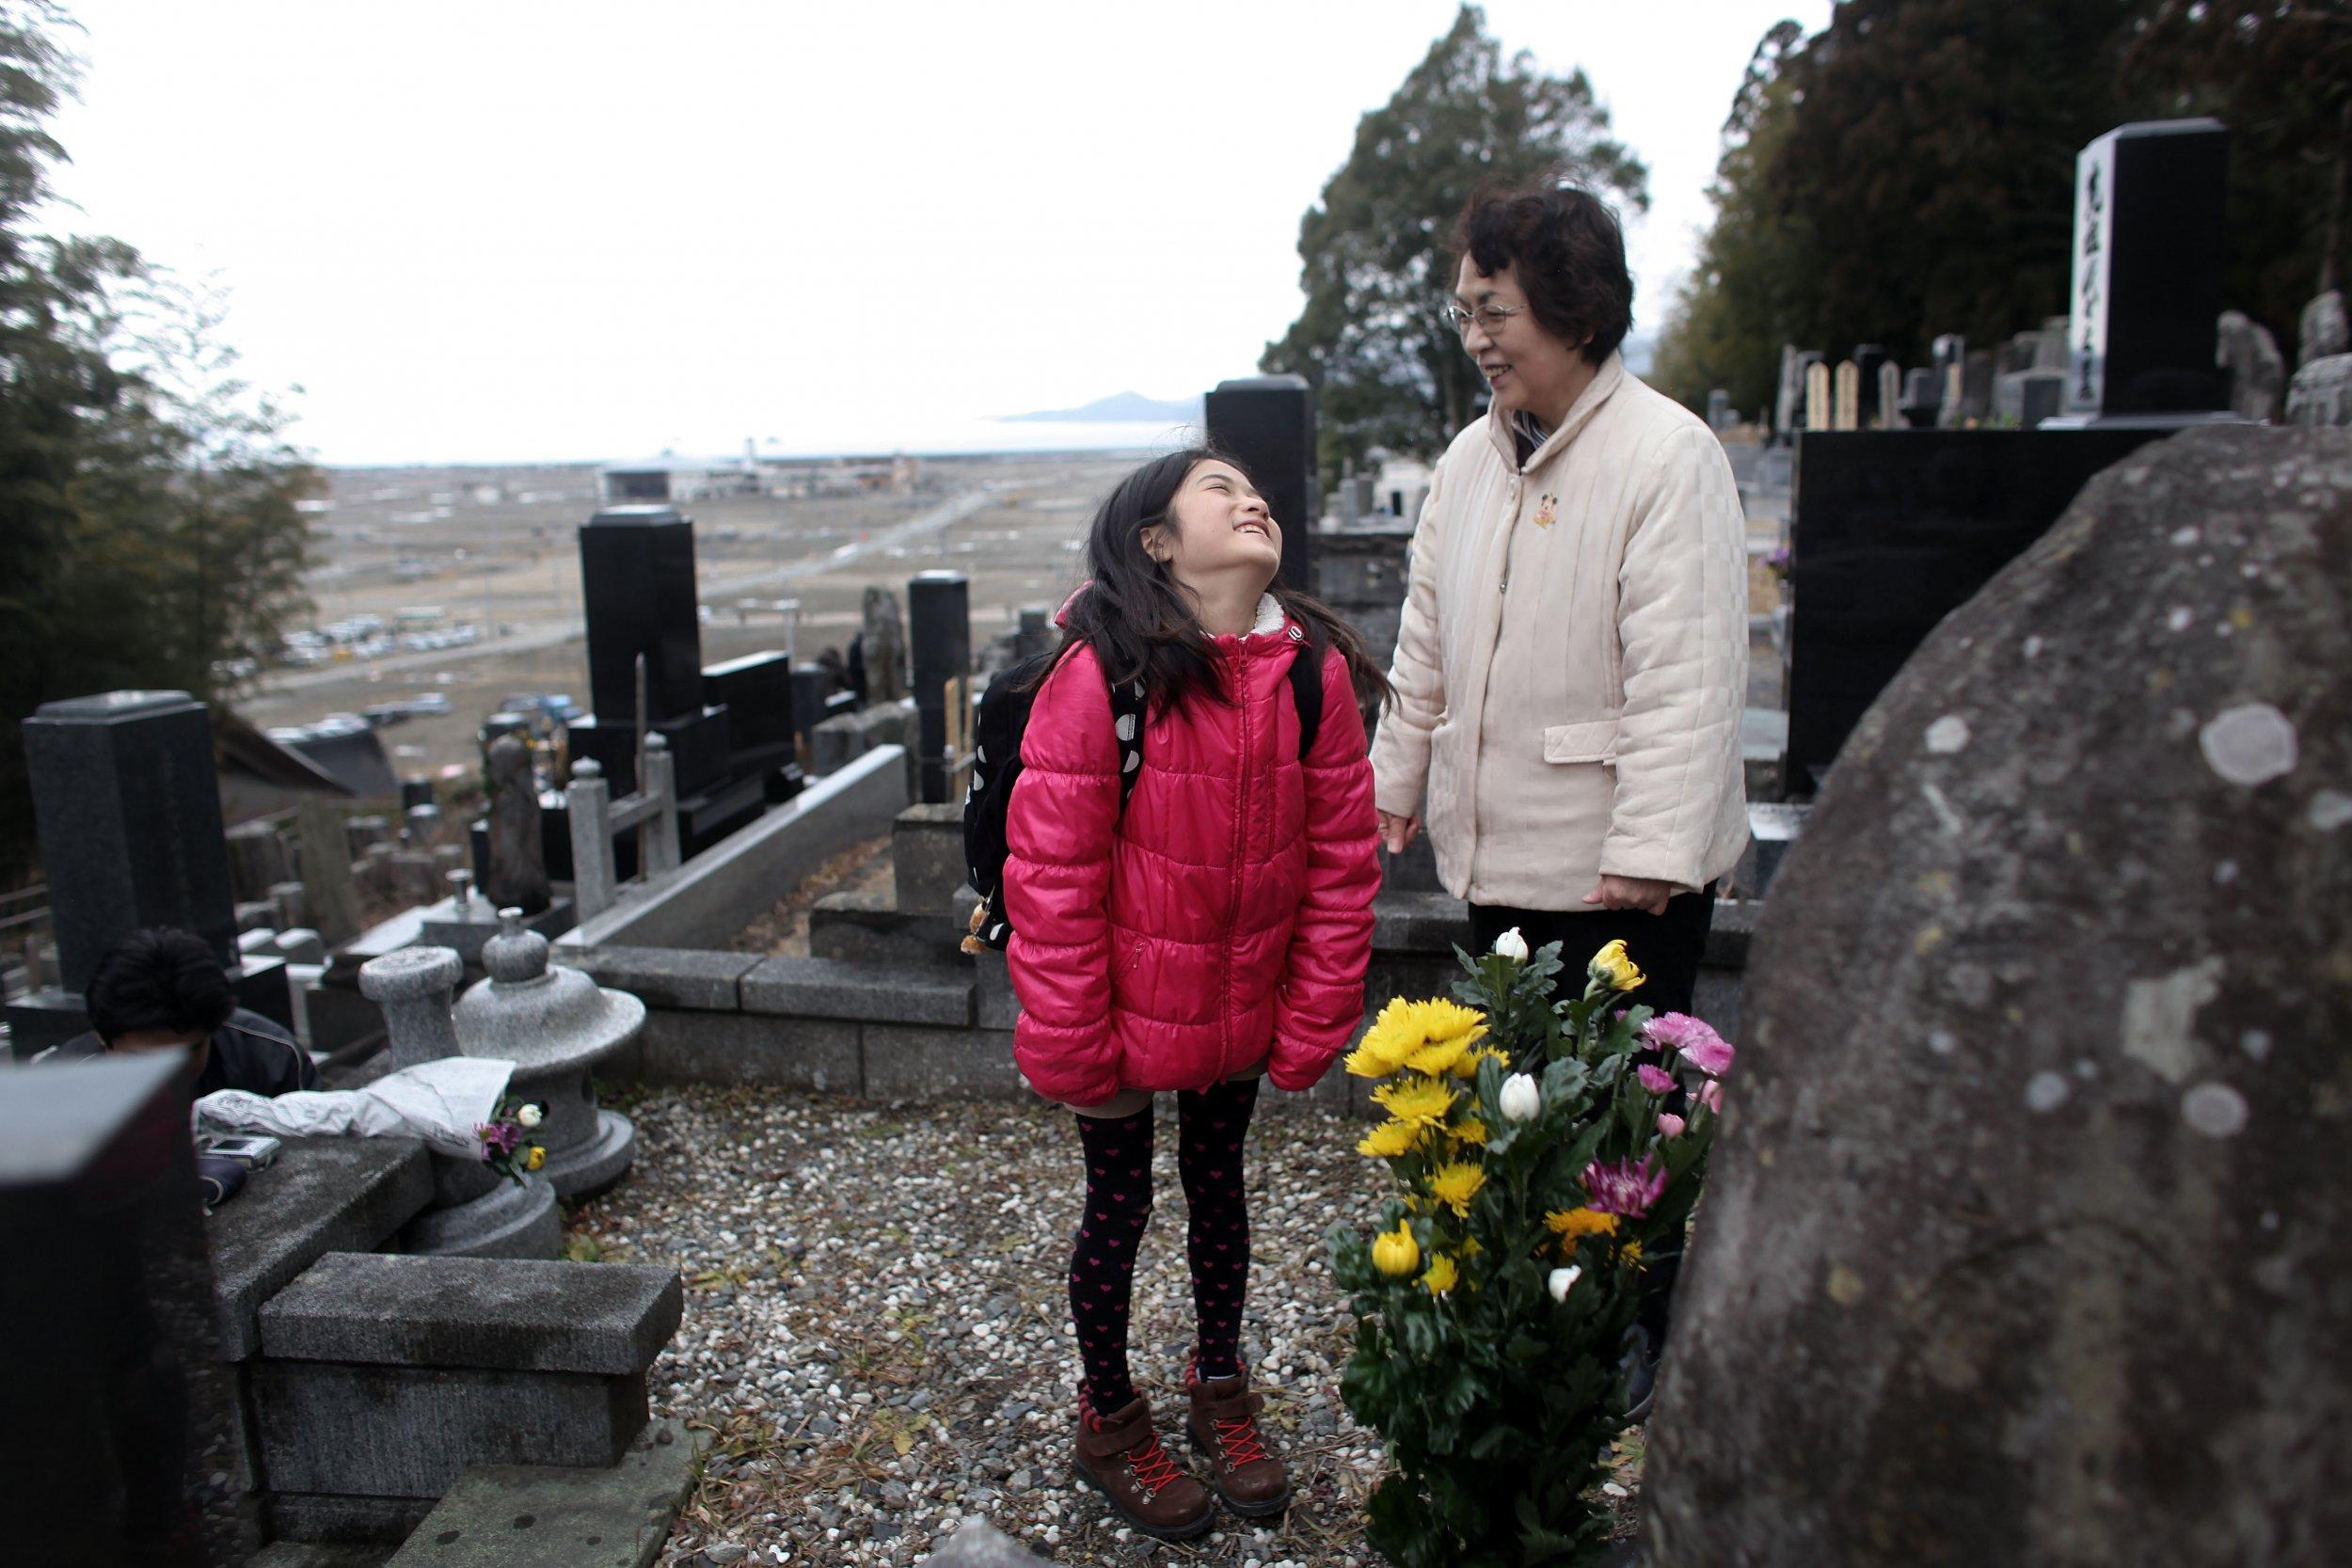 Nina Kanno jokes around with her grandmother Mieko Kanno